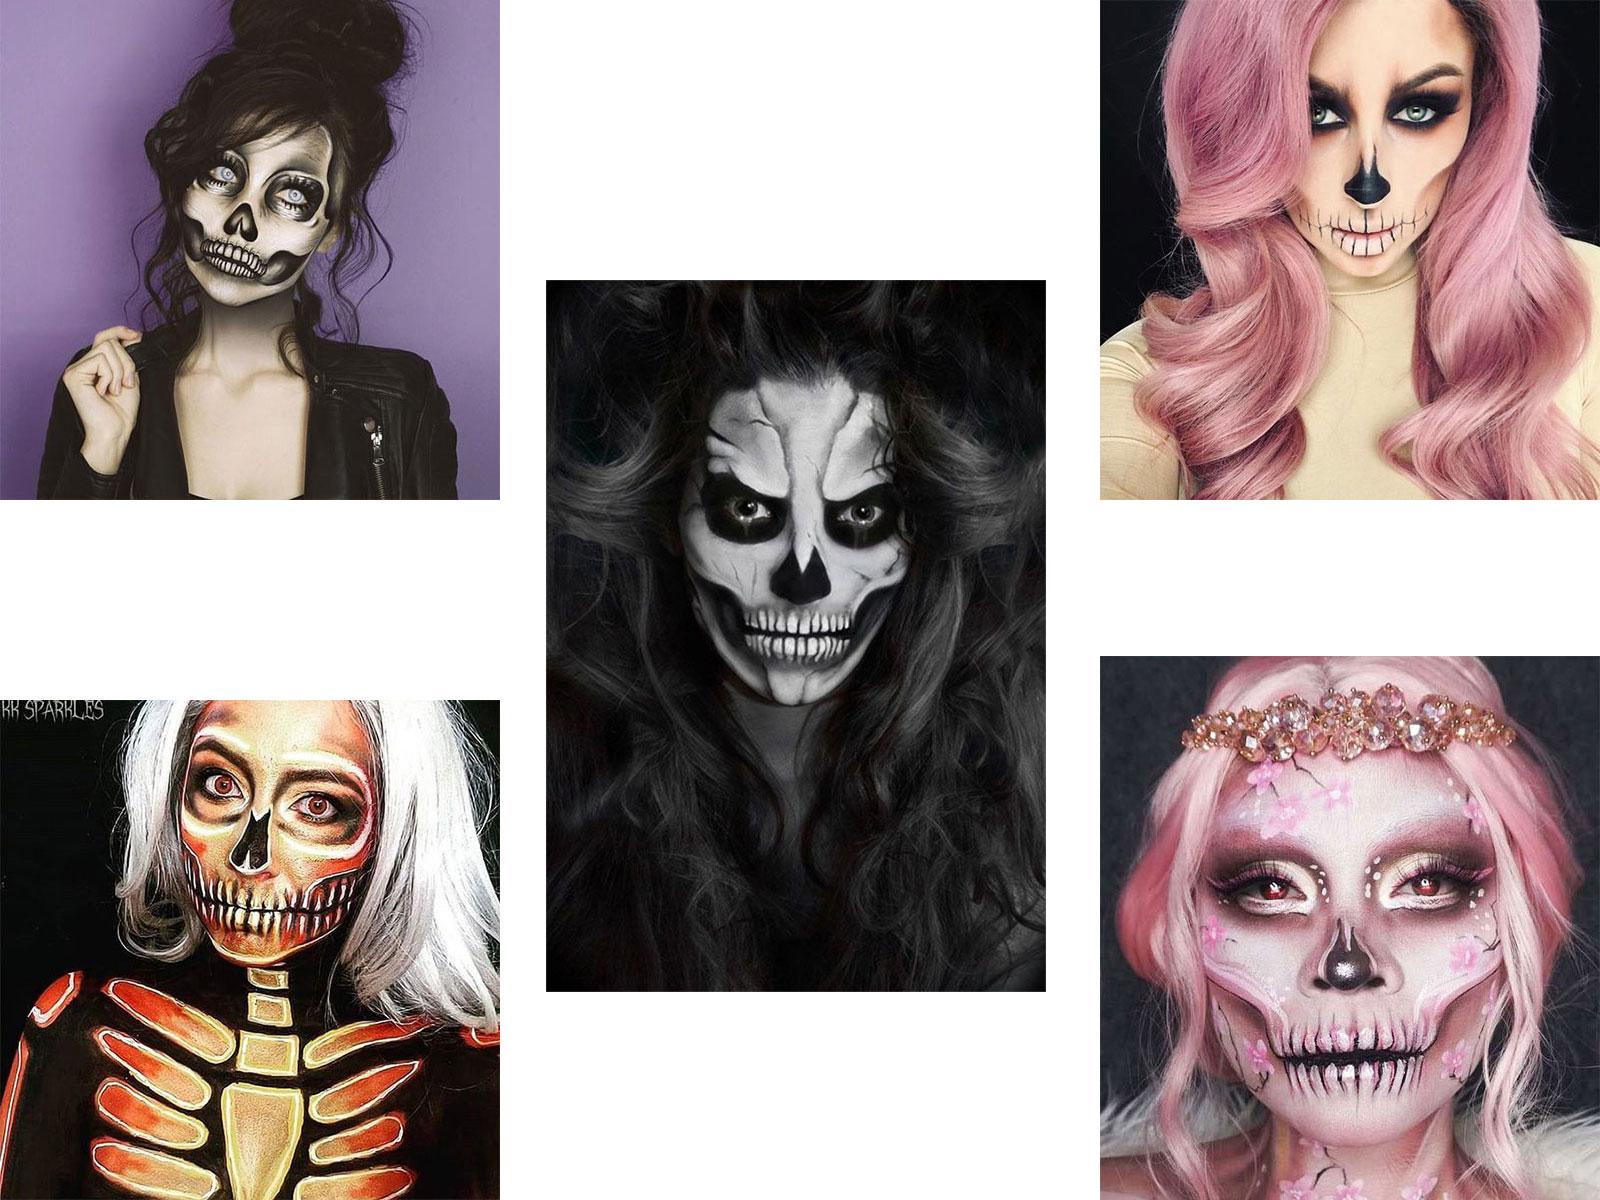 Halloween Makeup Ideas 2019 Scary.20 Creepy Skull Skeleton Halloween Makeup Ideas Trends